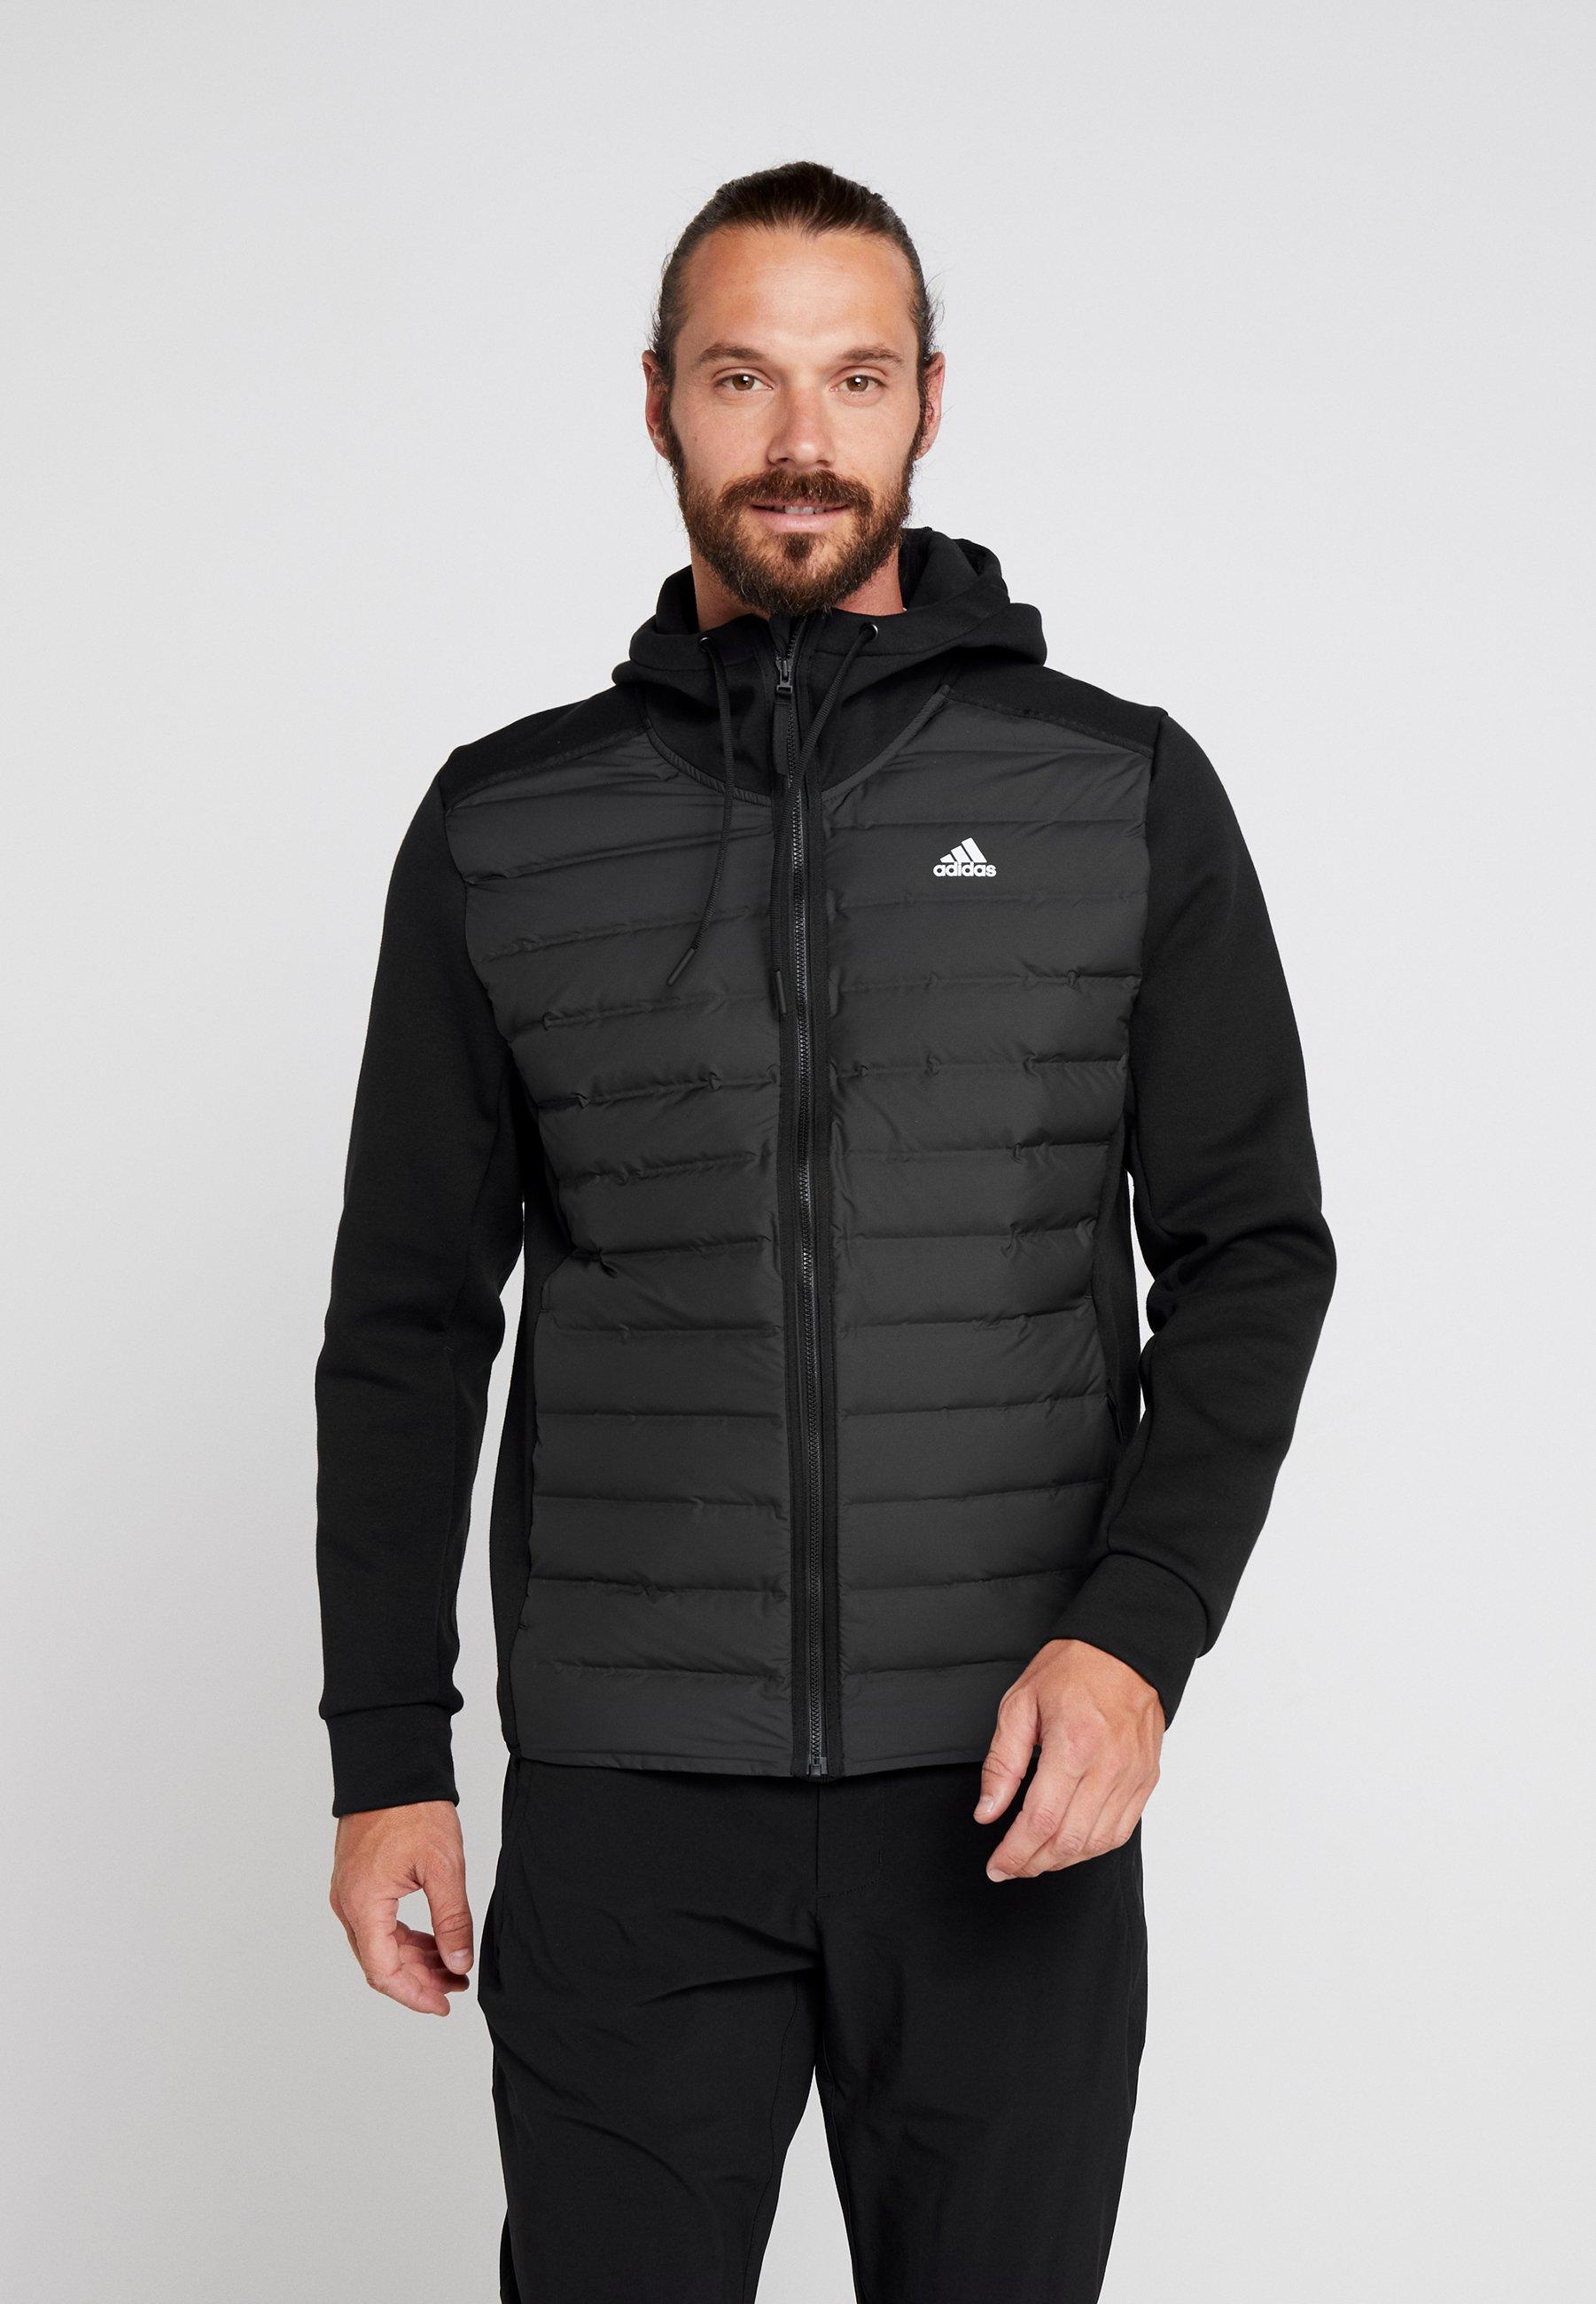 Fashionable Online Cheapest Men's Clothing adidas Performance VARILITE HYBRID DOWN JACKET Winter jacket black 3t675iNIr drRMas0jm